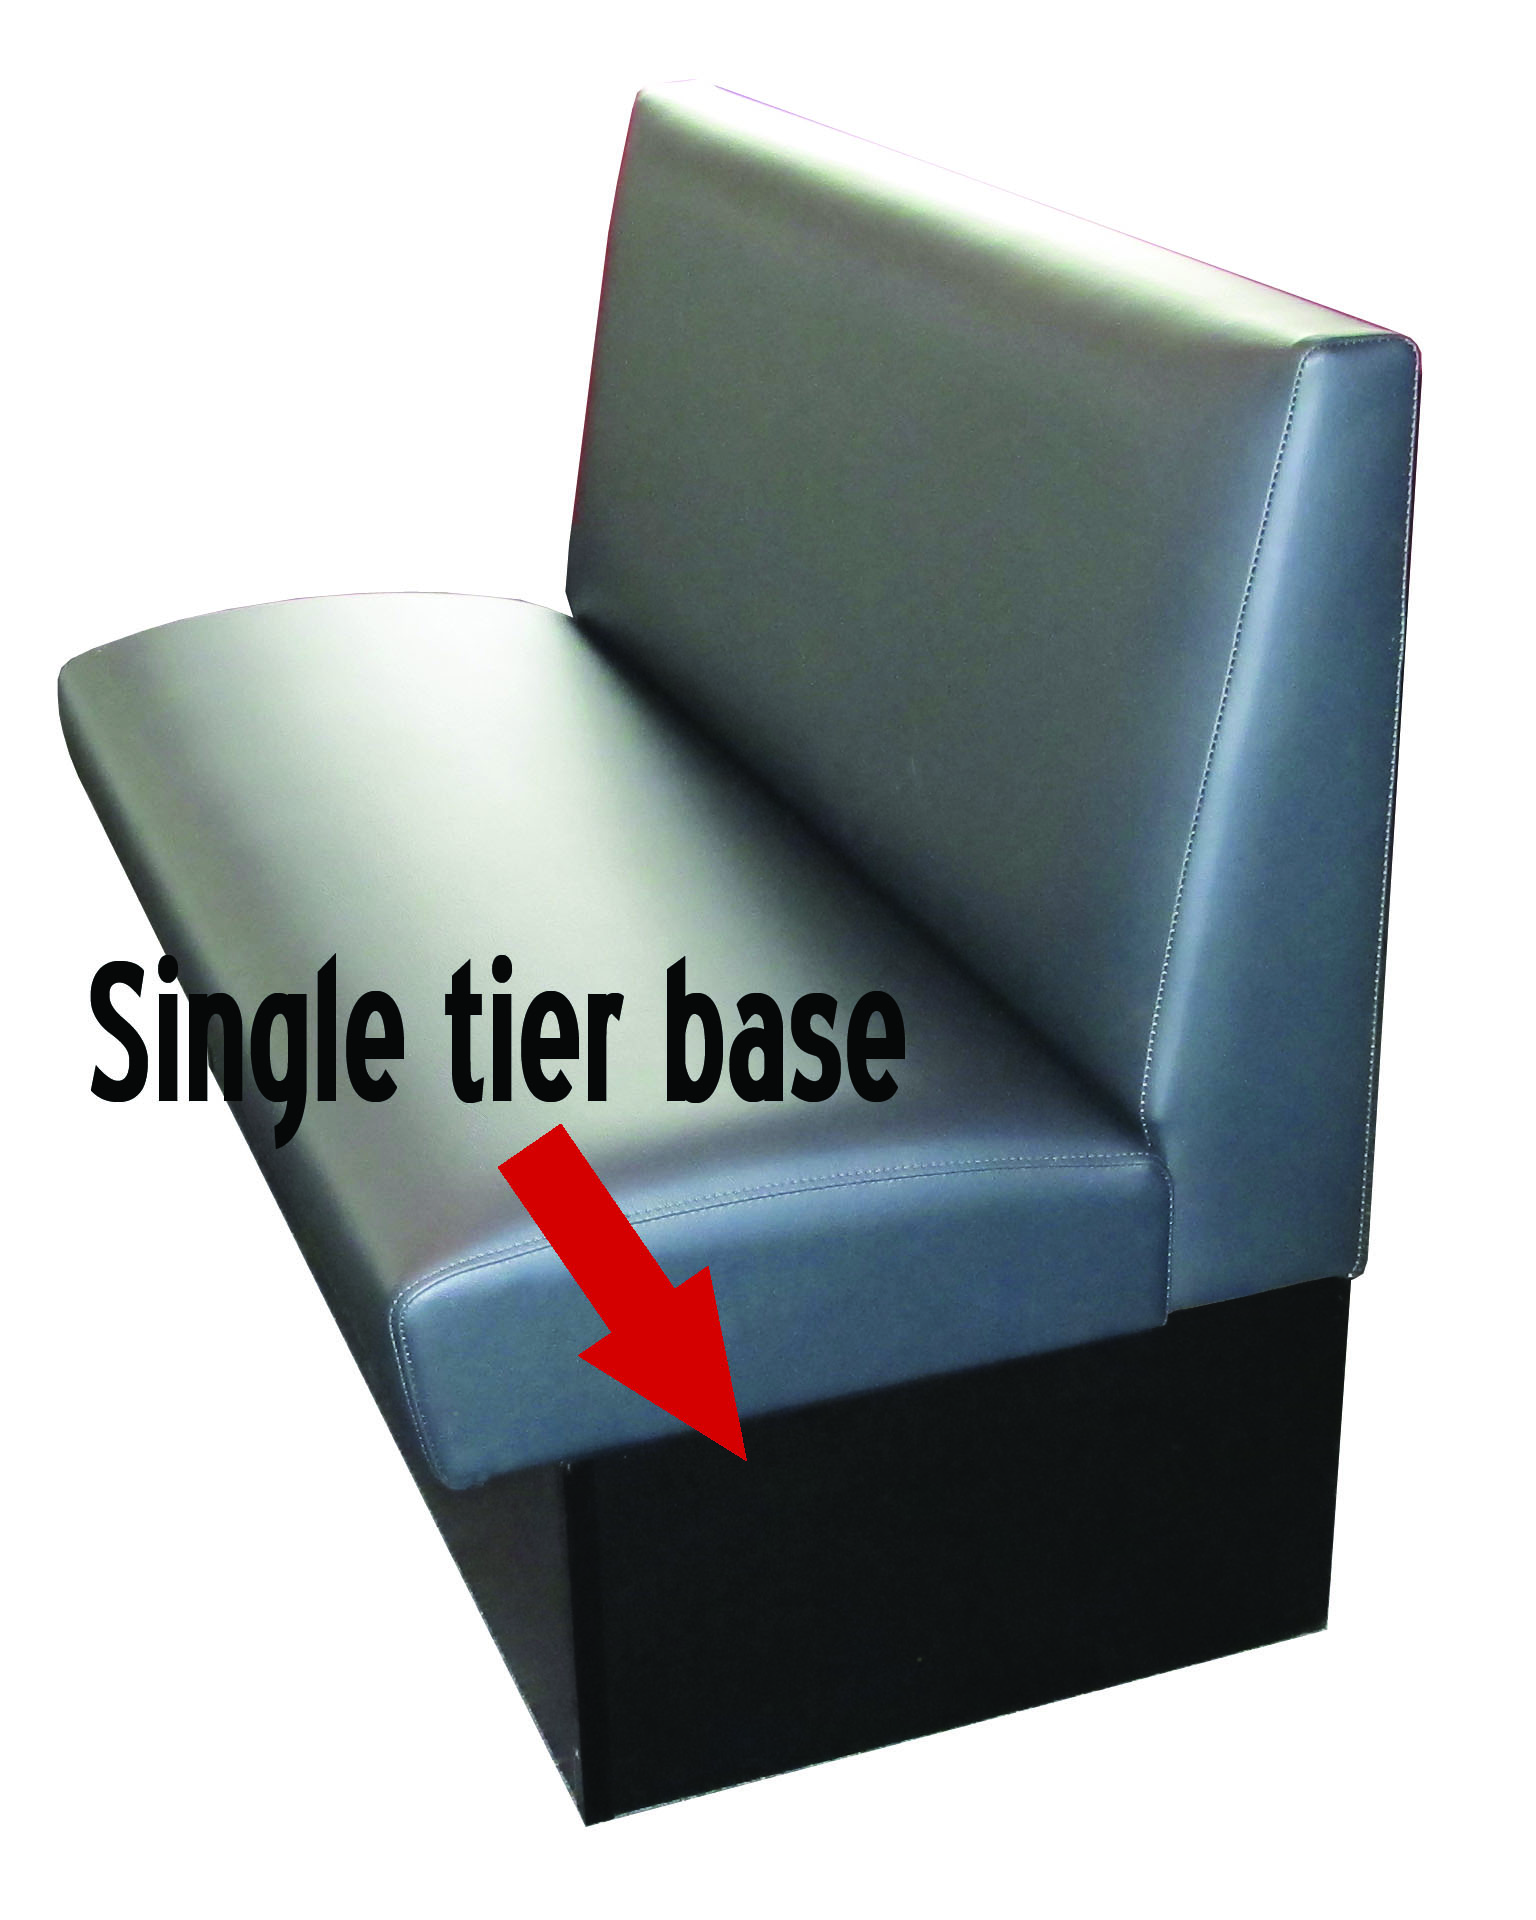 single tier base